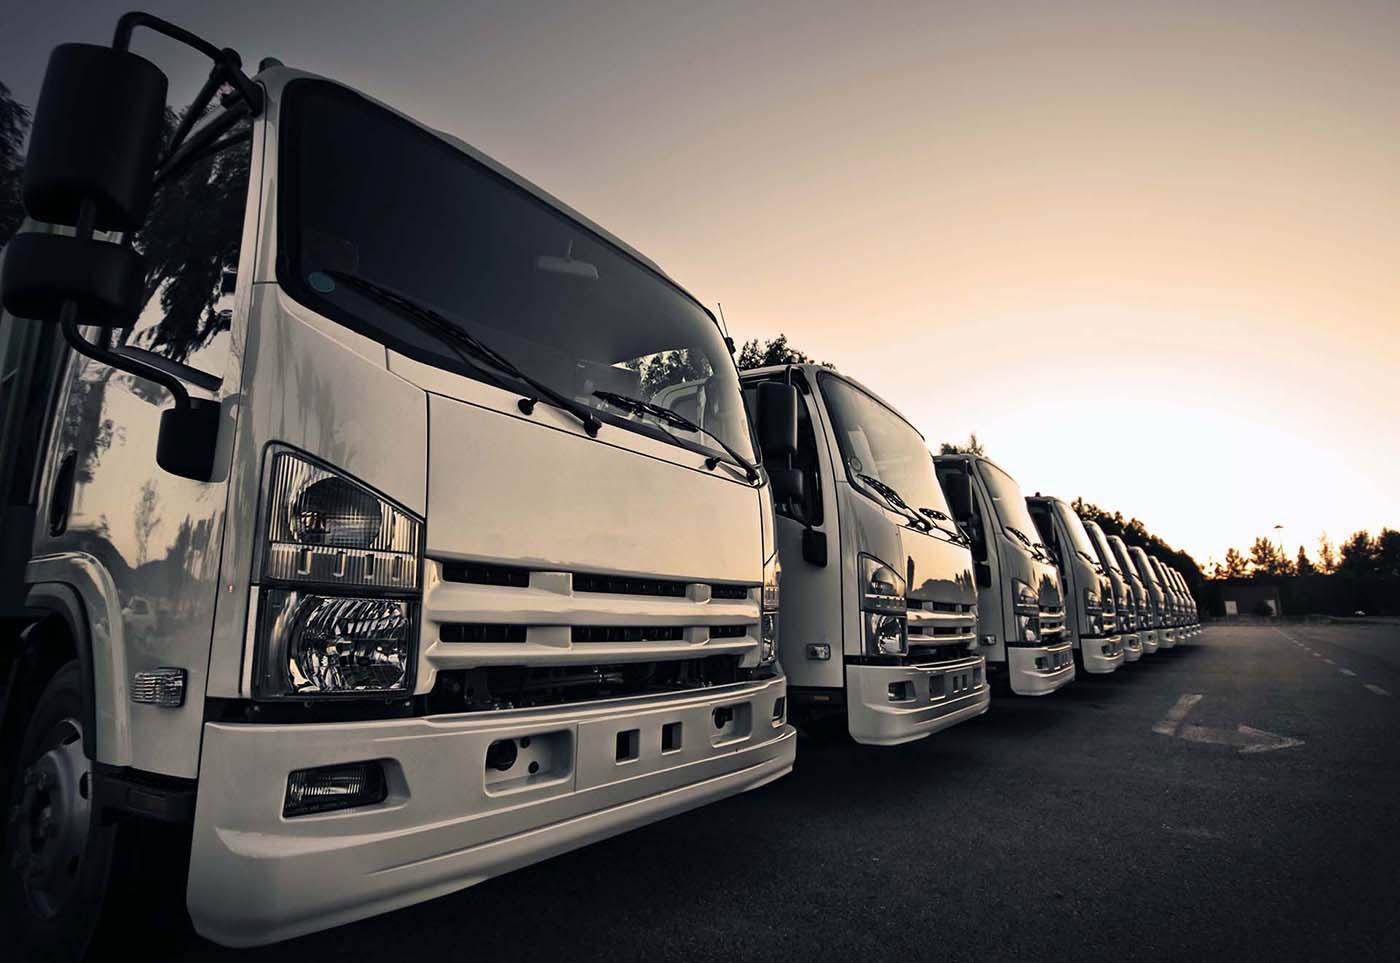 erp transporte mercancias logistica almacenes